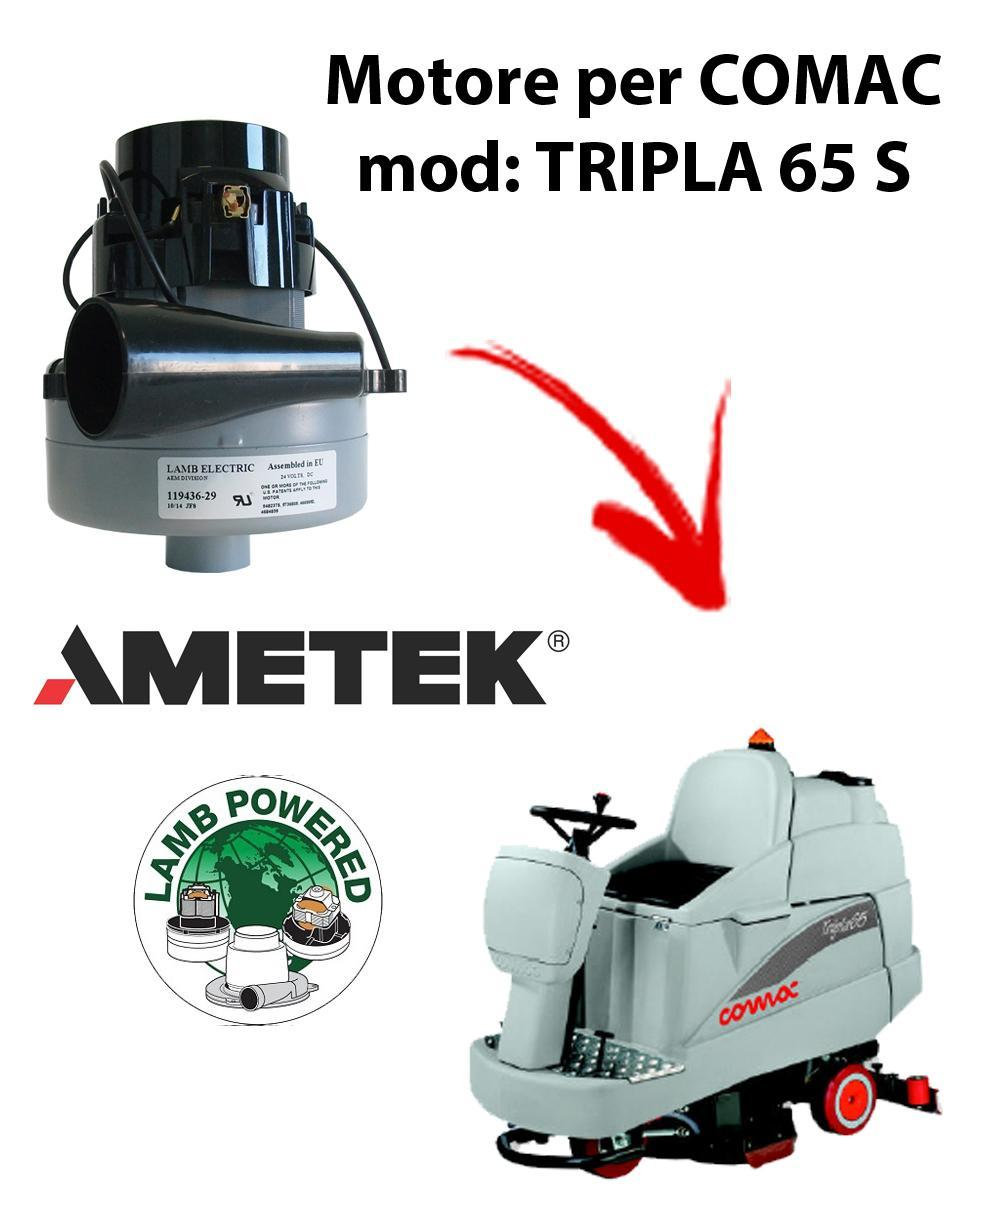 Tripla 65S Motore de aspiración AMETEK  fregadoras Comac a partire dal 2009